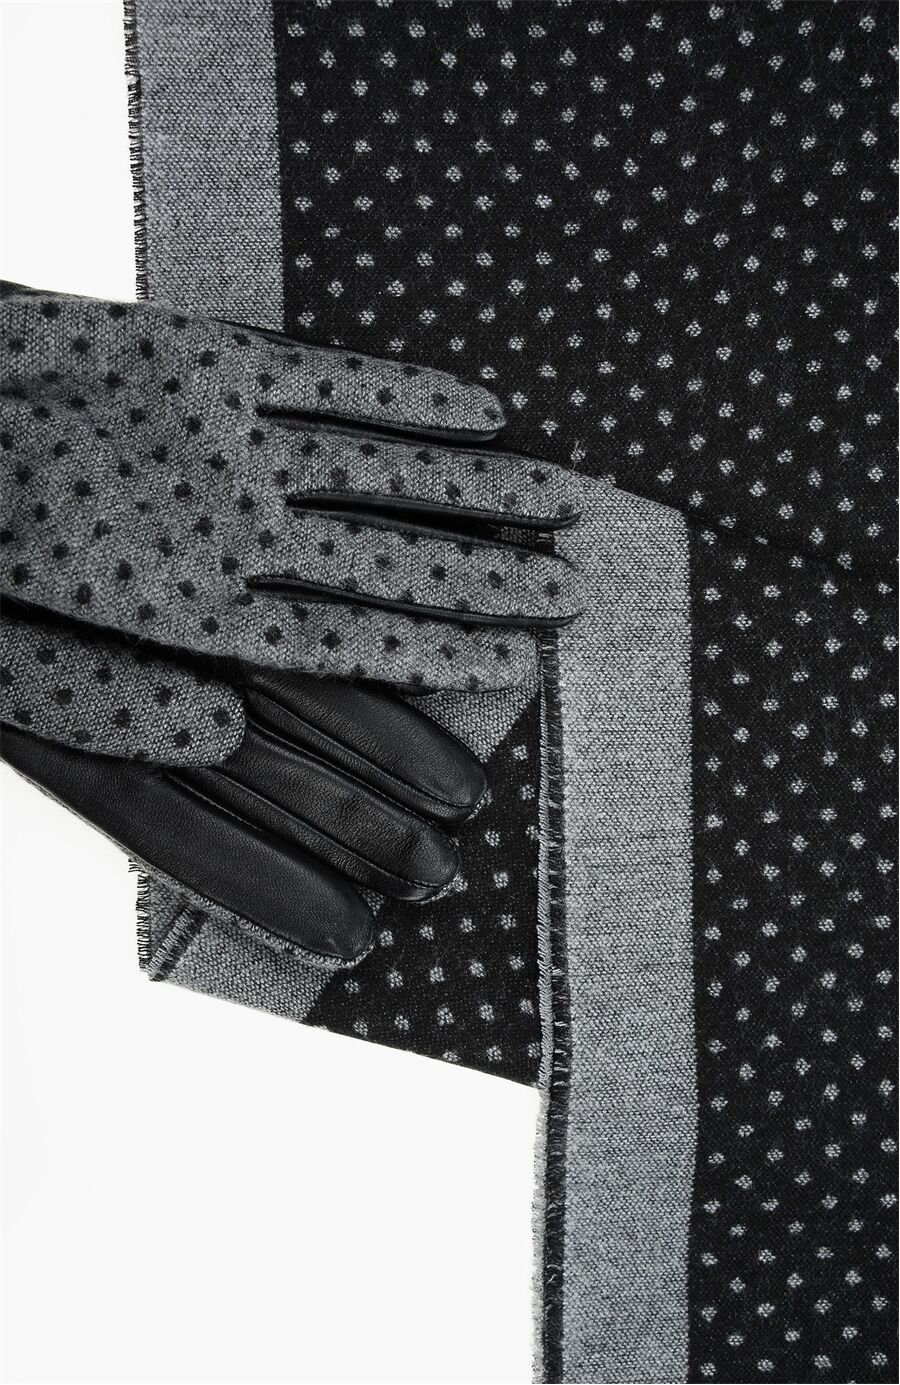 Gri Atkı + Kadın Eldiven Set